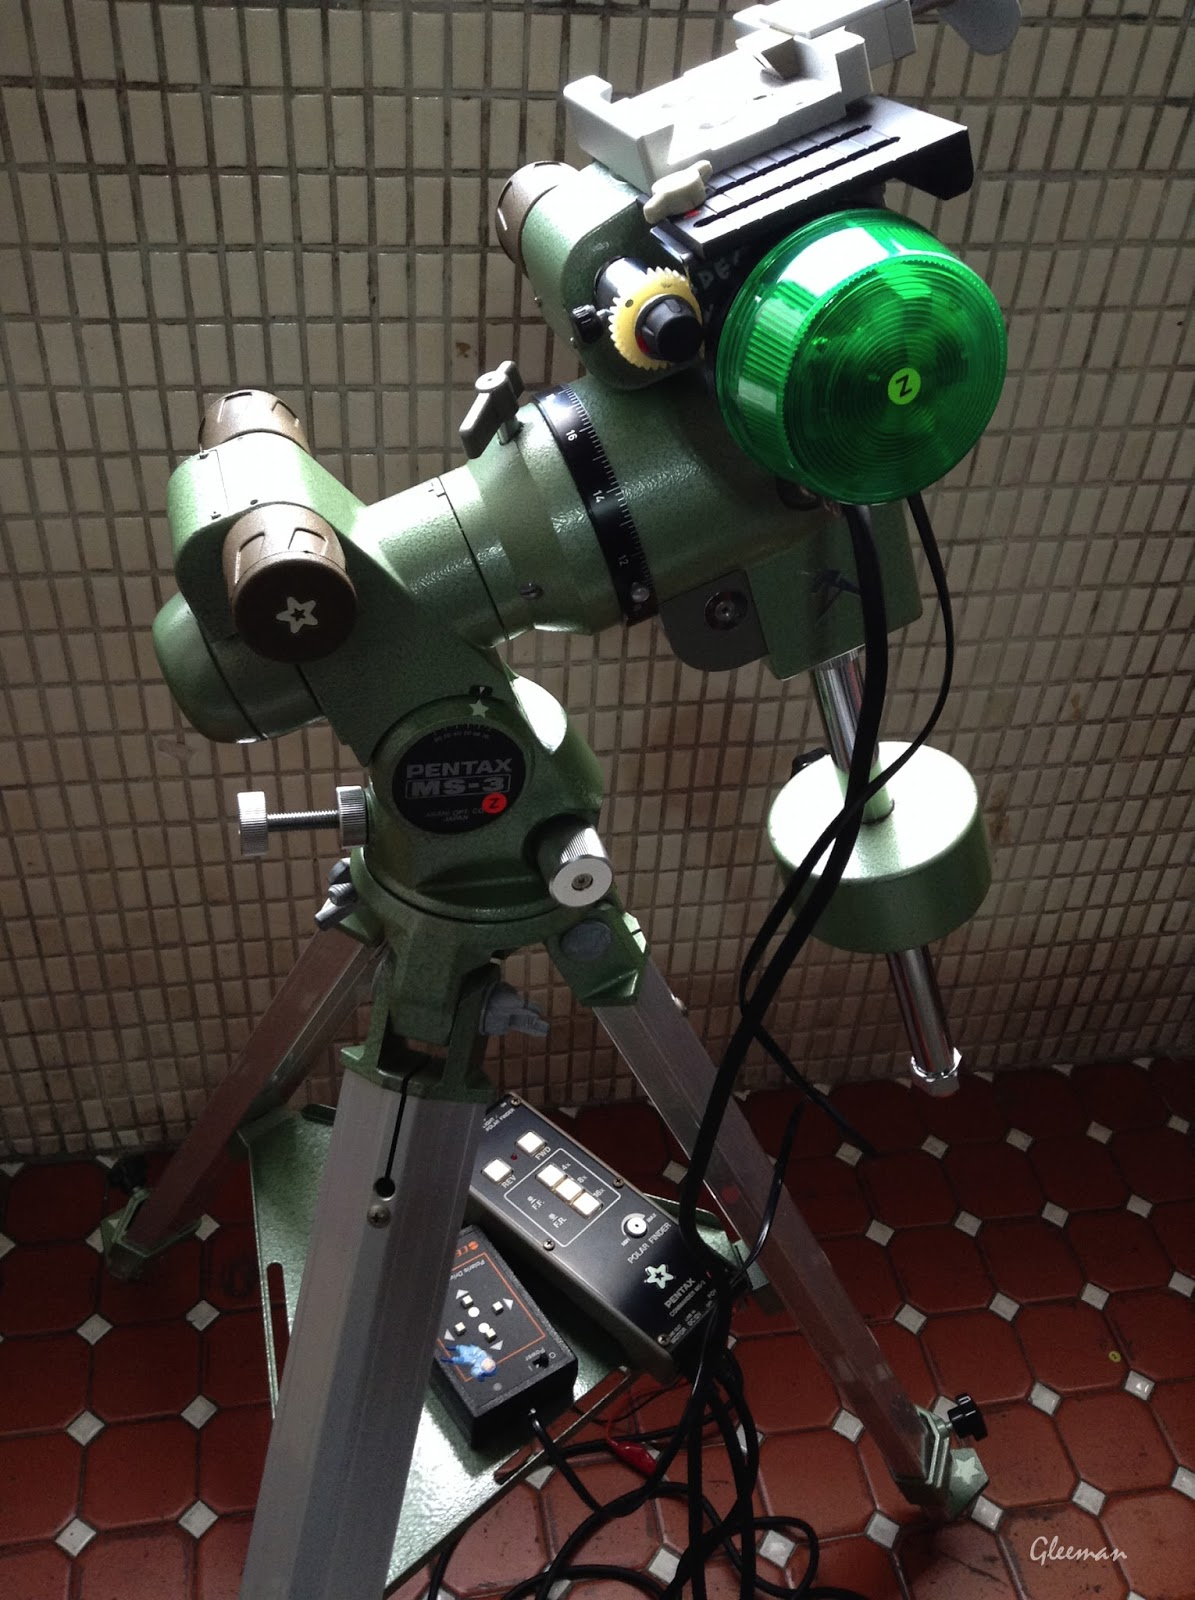 Pentax MS-3 (upgrade to Zeta)